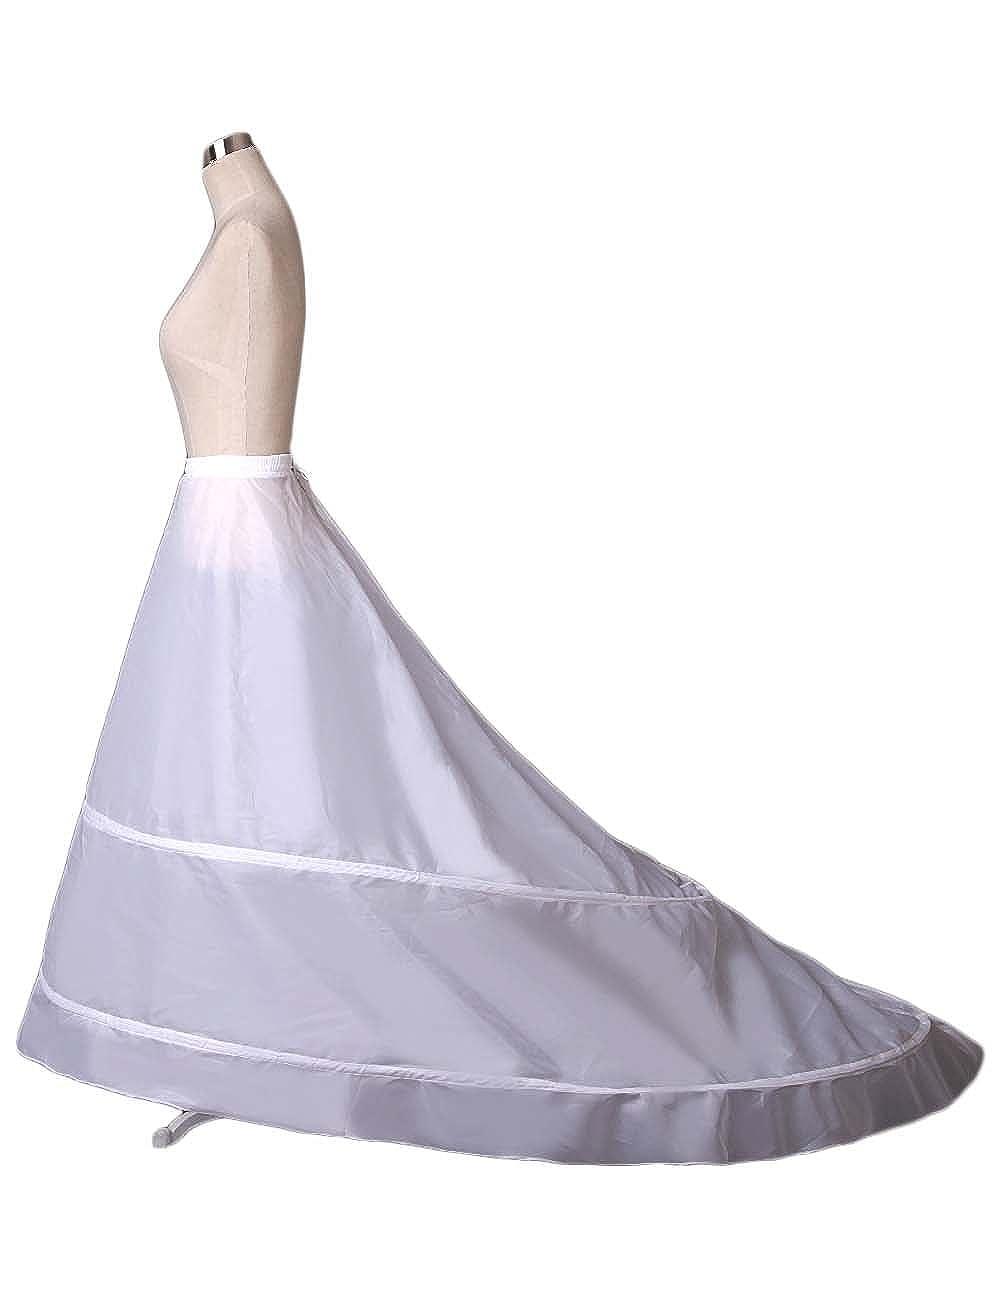 Ruiyuhong Womens A-line 2-Hoop Petticoat Underskirt Crinoline for Wedding Dress Train PE04 White at Amazon Womens Clothing store: